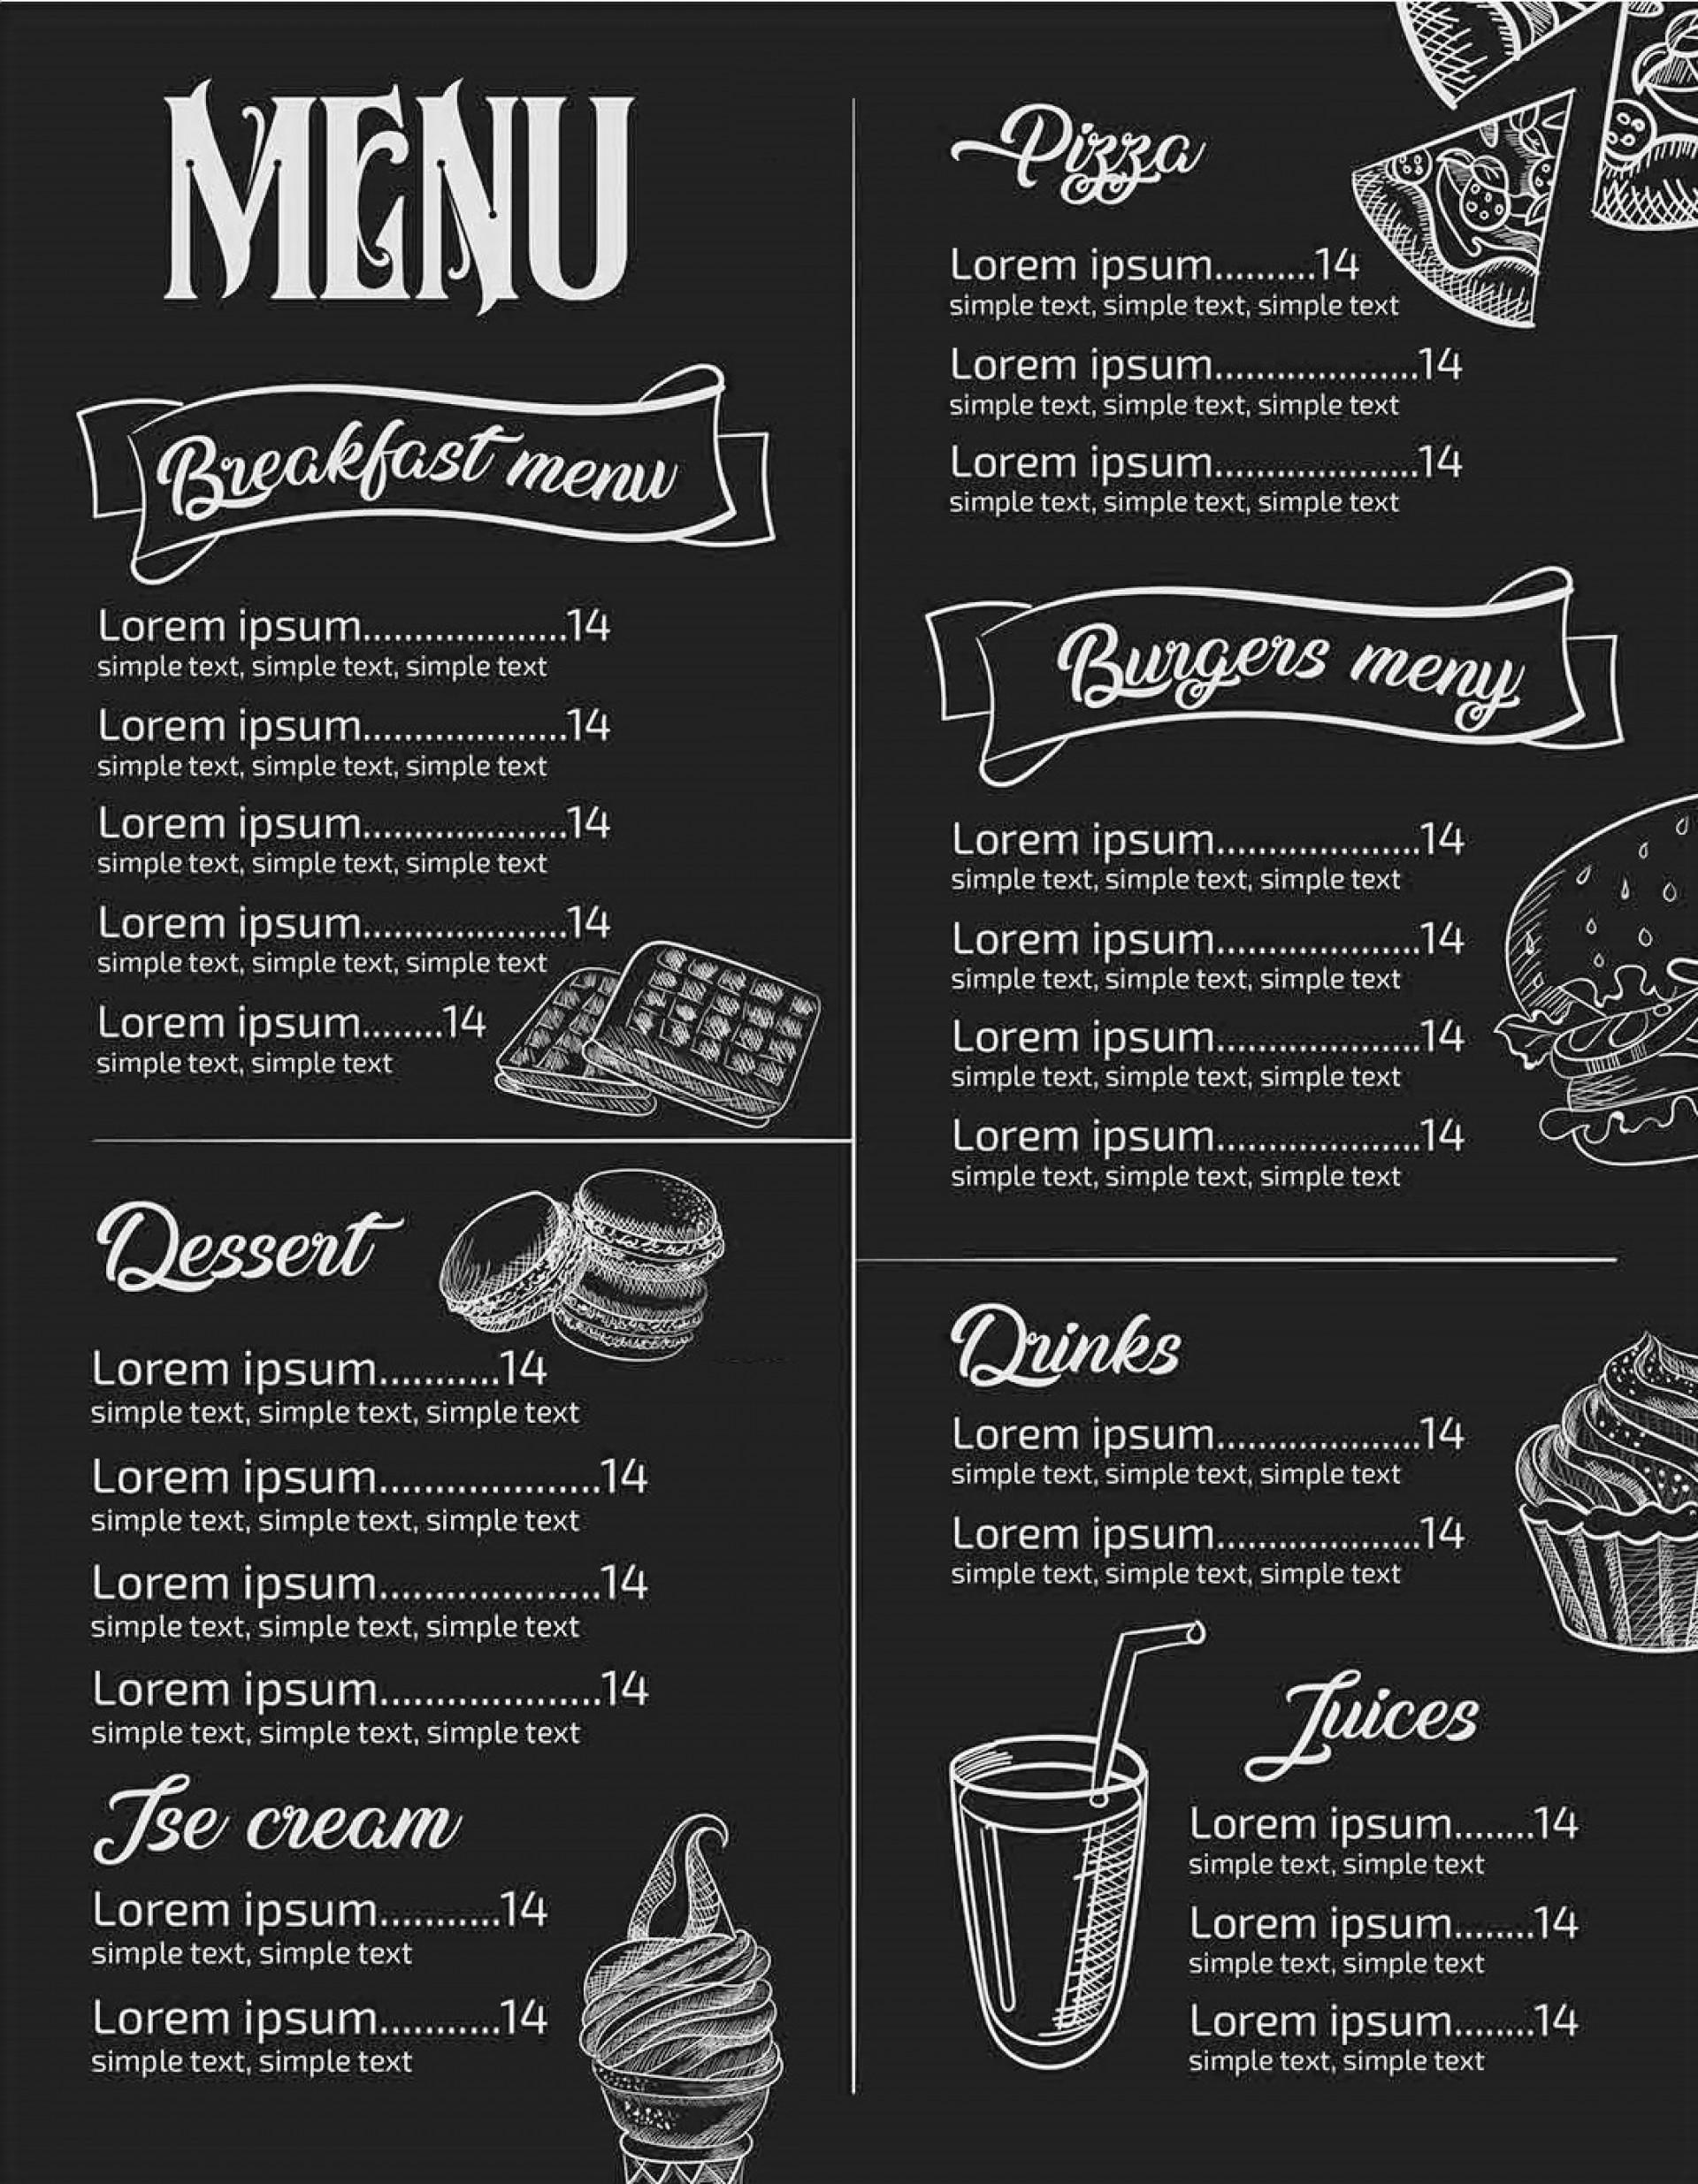 Menu Template Free Download Restaurant  Psd Word Html1920